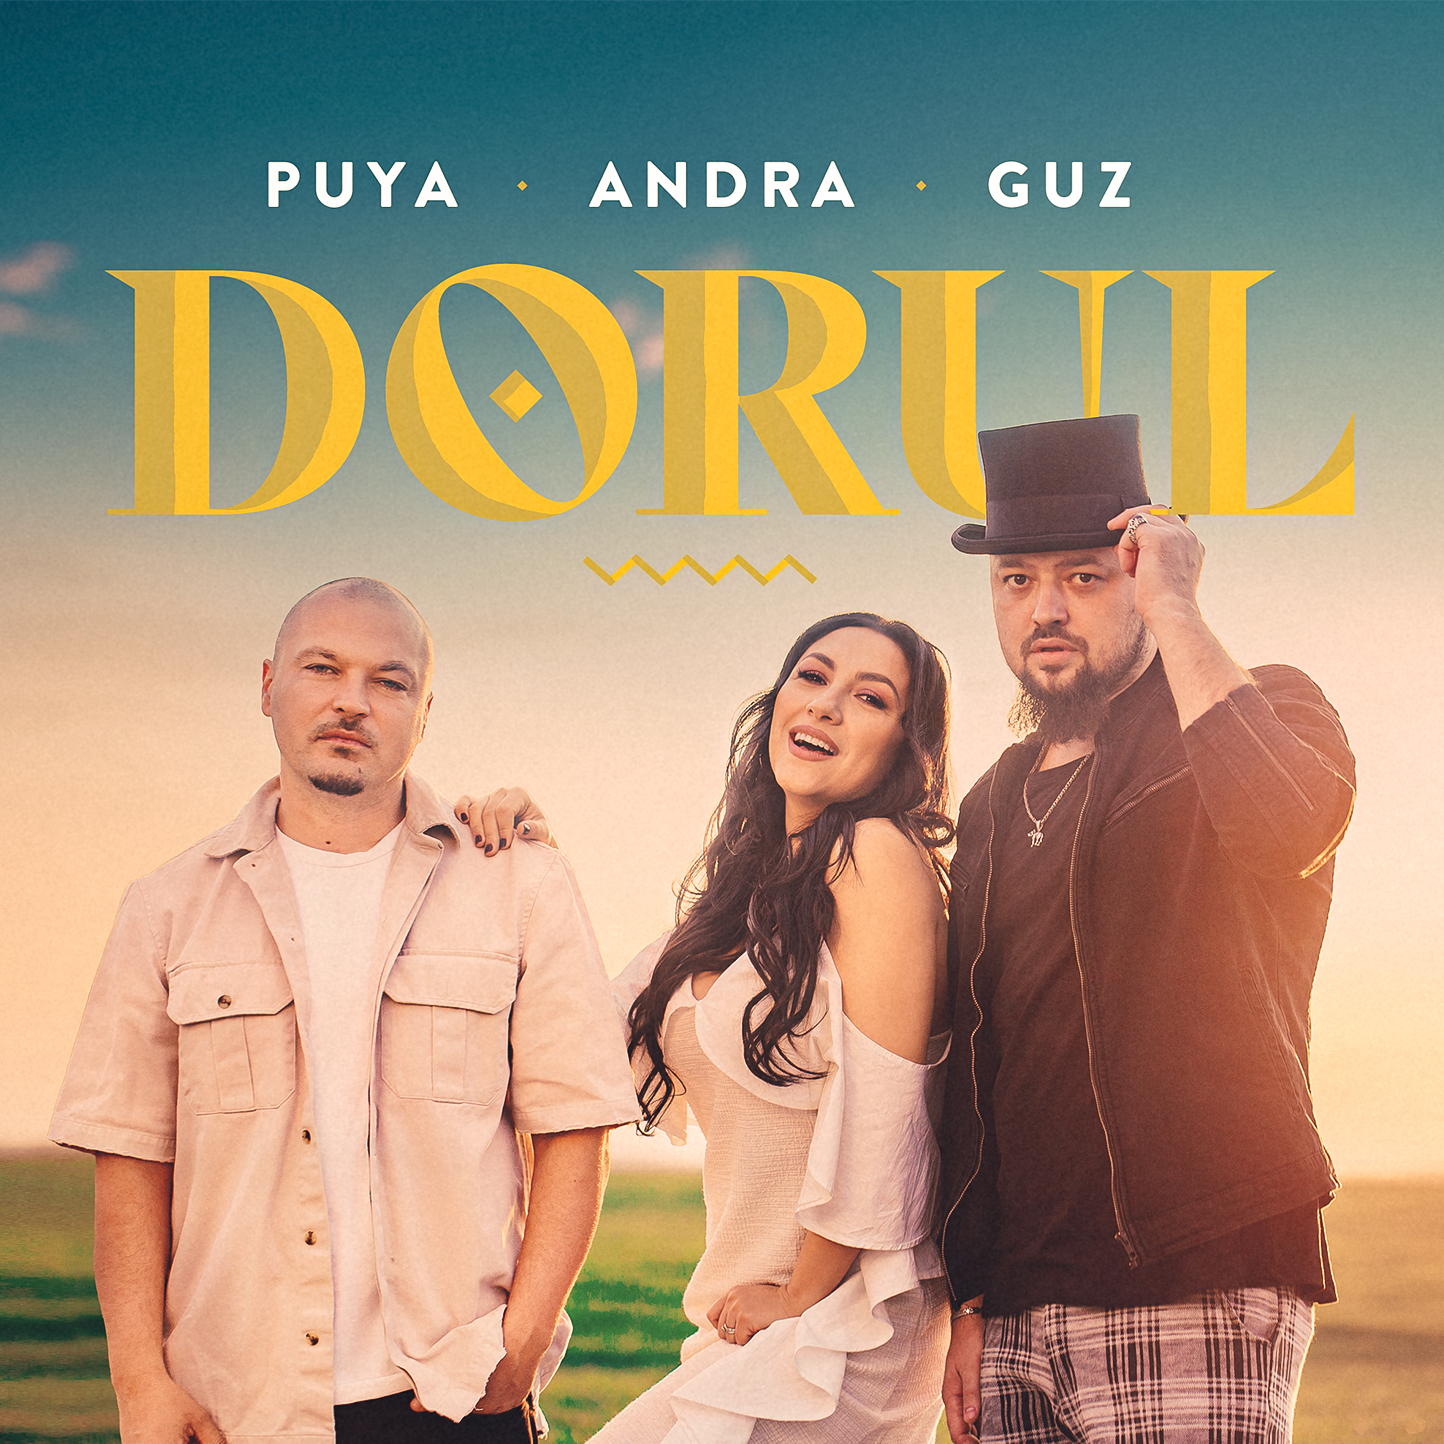 Puya Andra Dorul